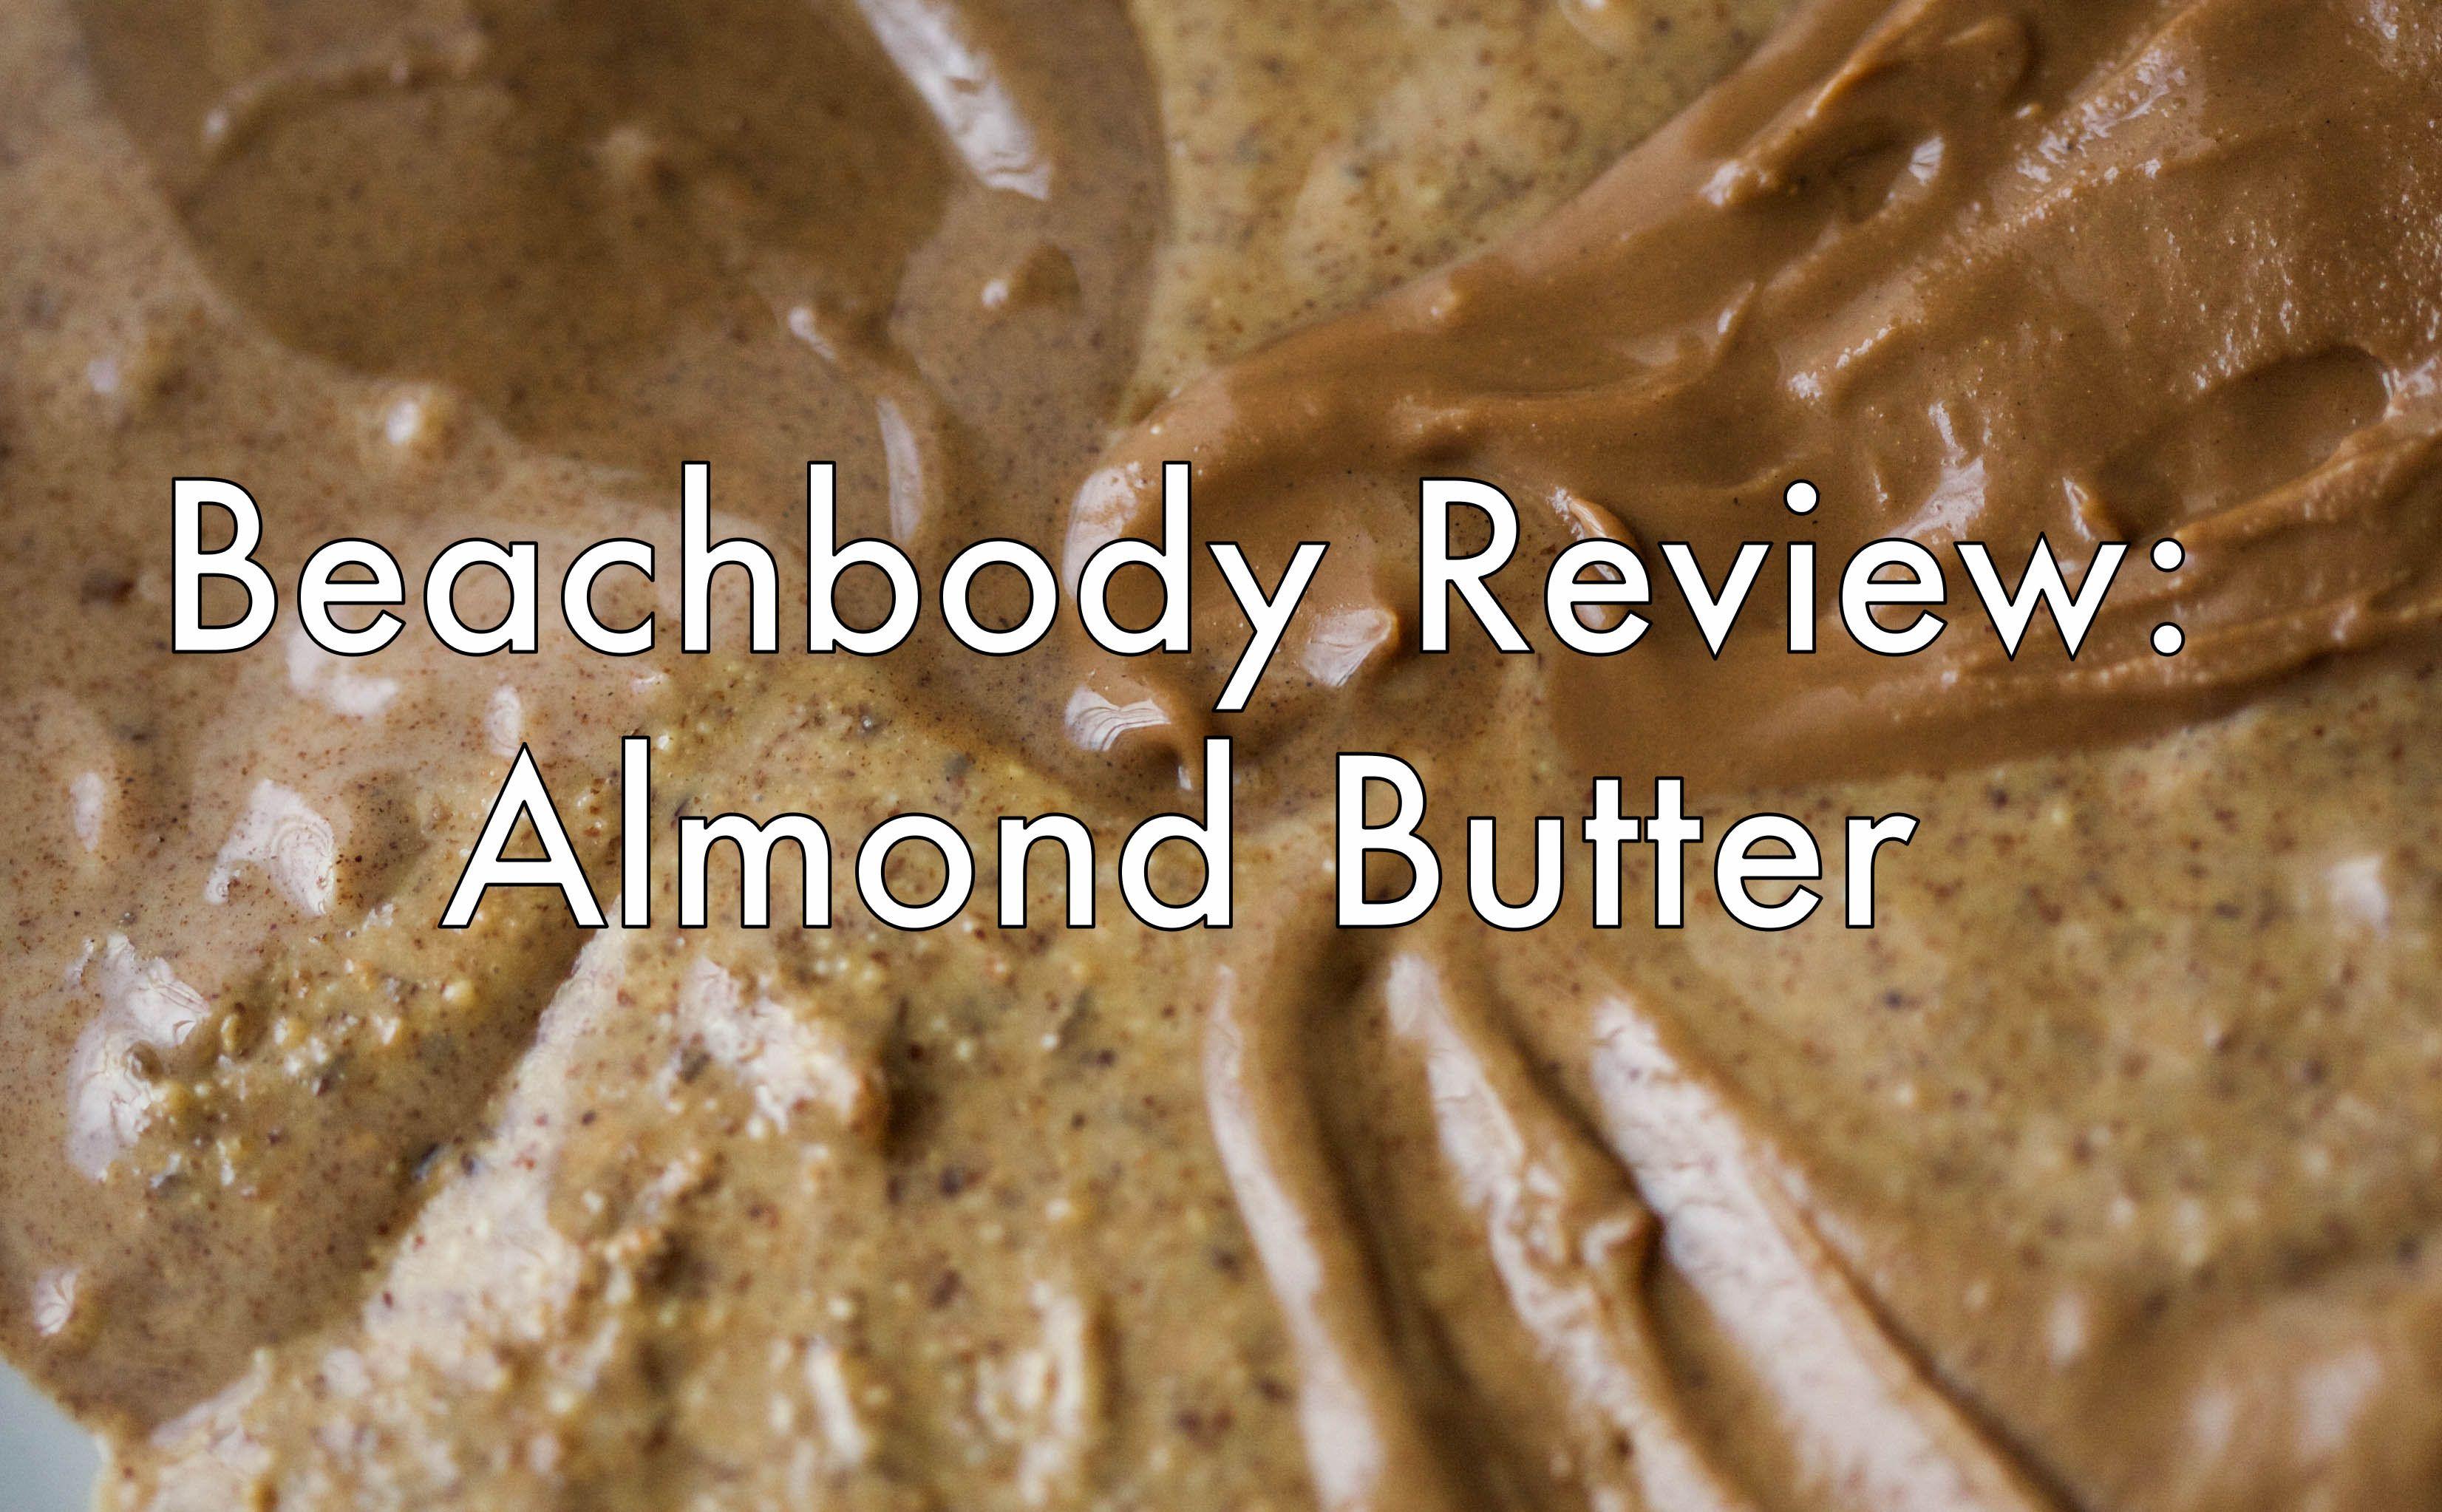 Beachbody Says Almond Butter Reviews Shakeology